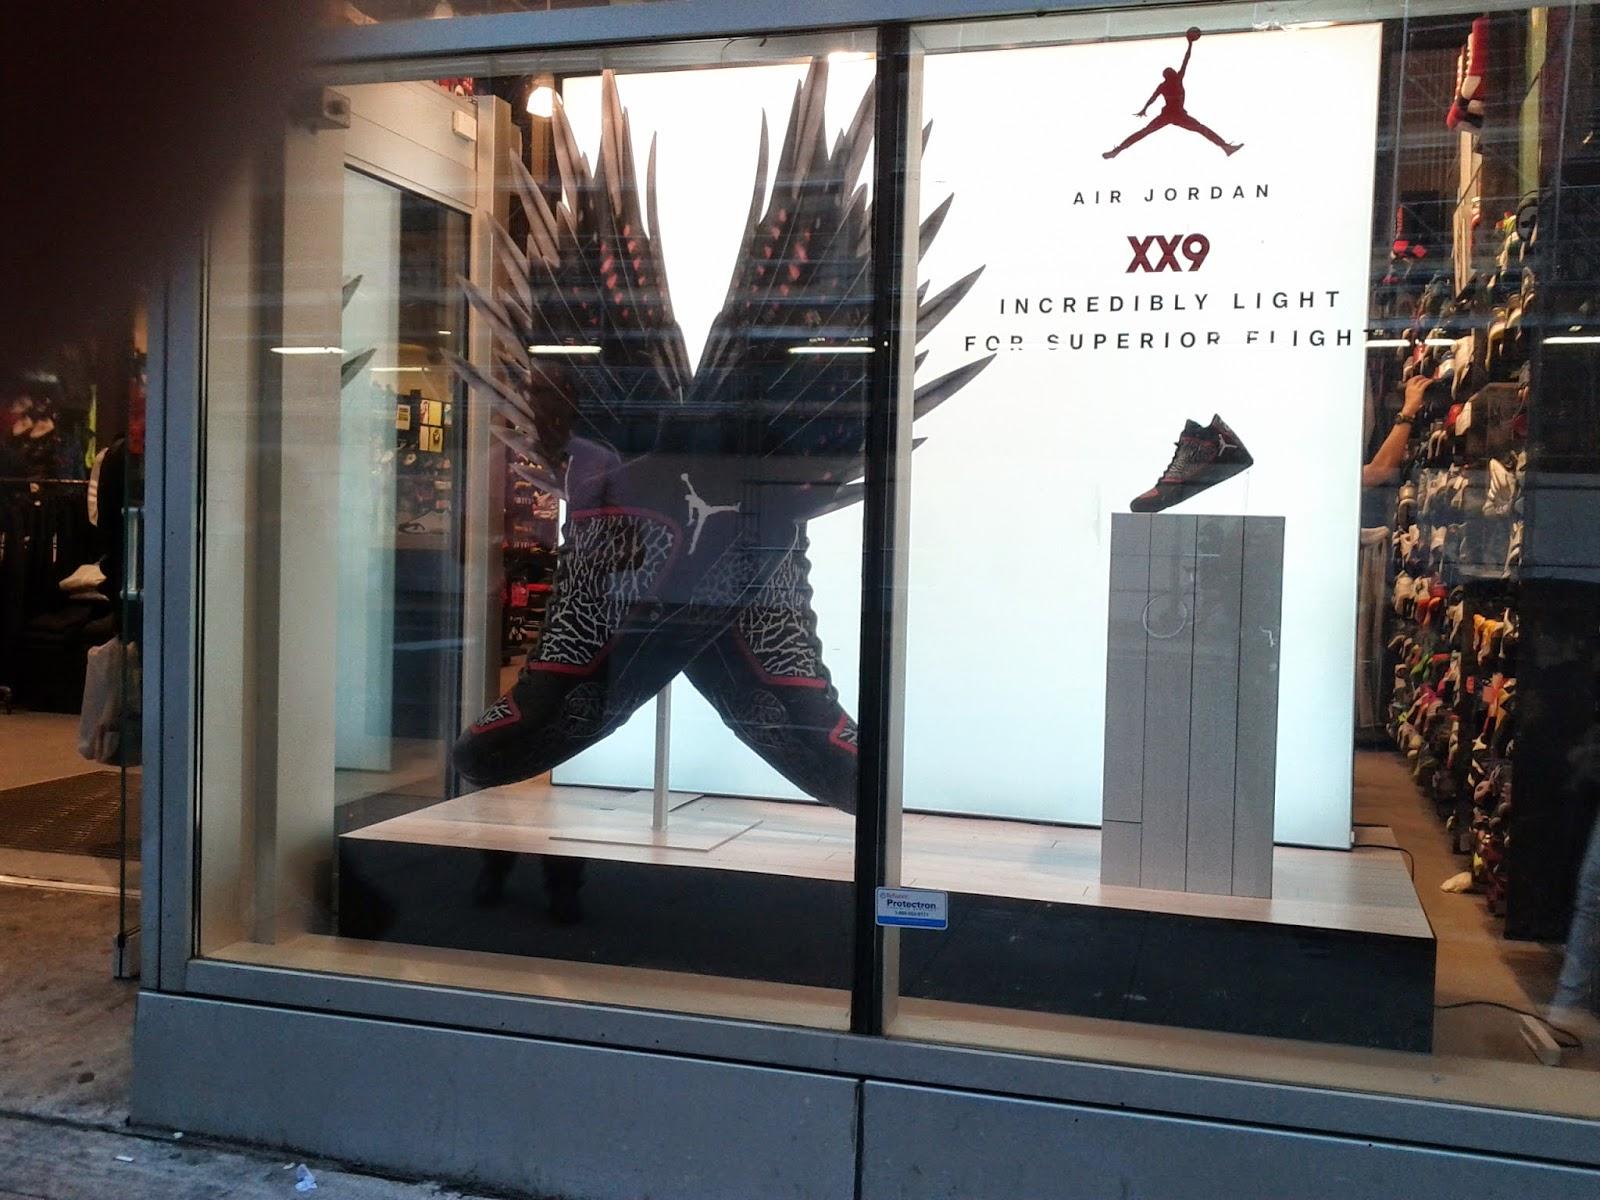 Jordan XX9 with wings